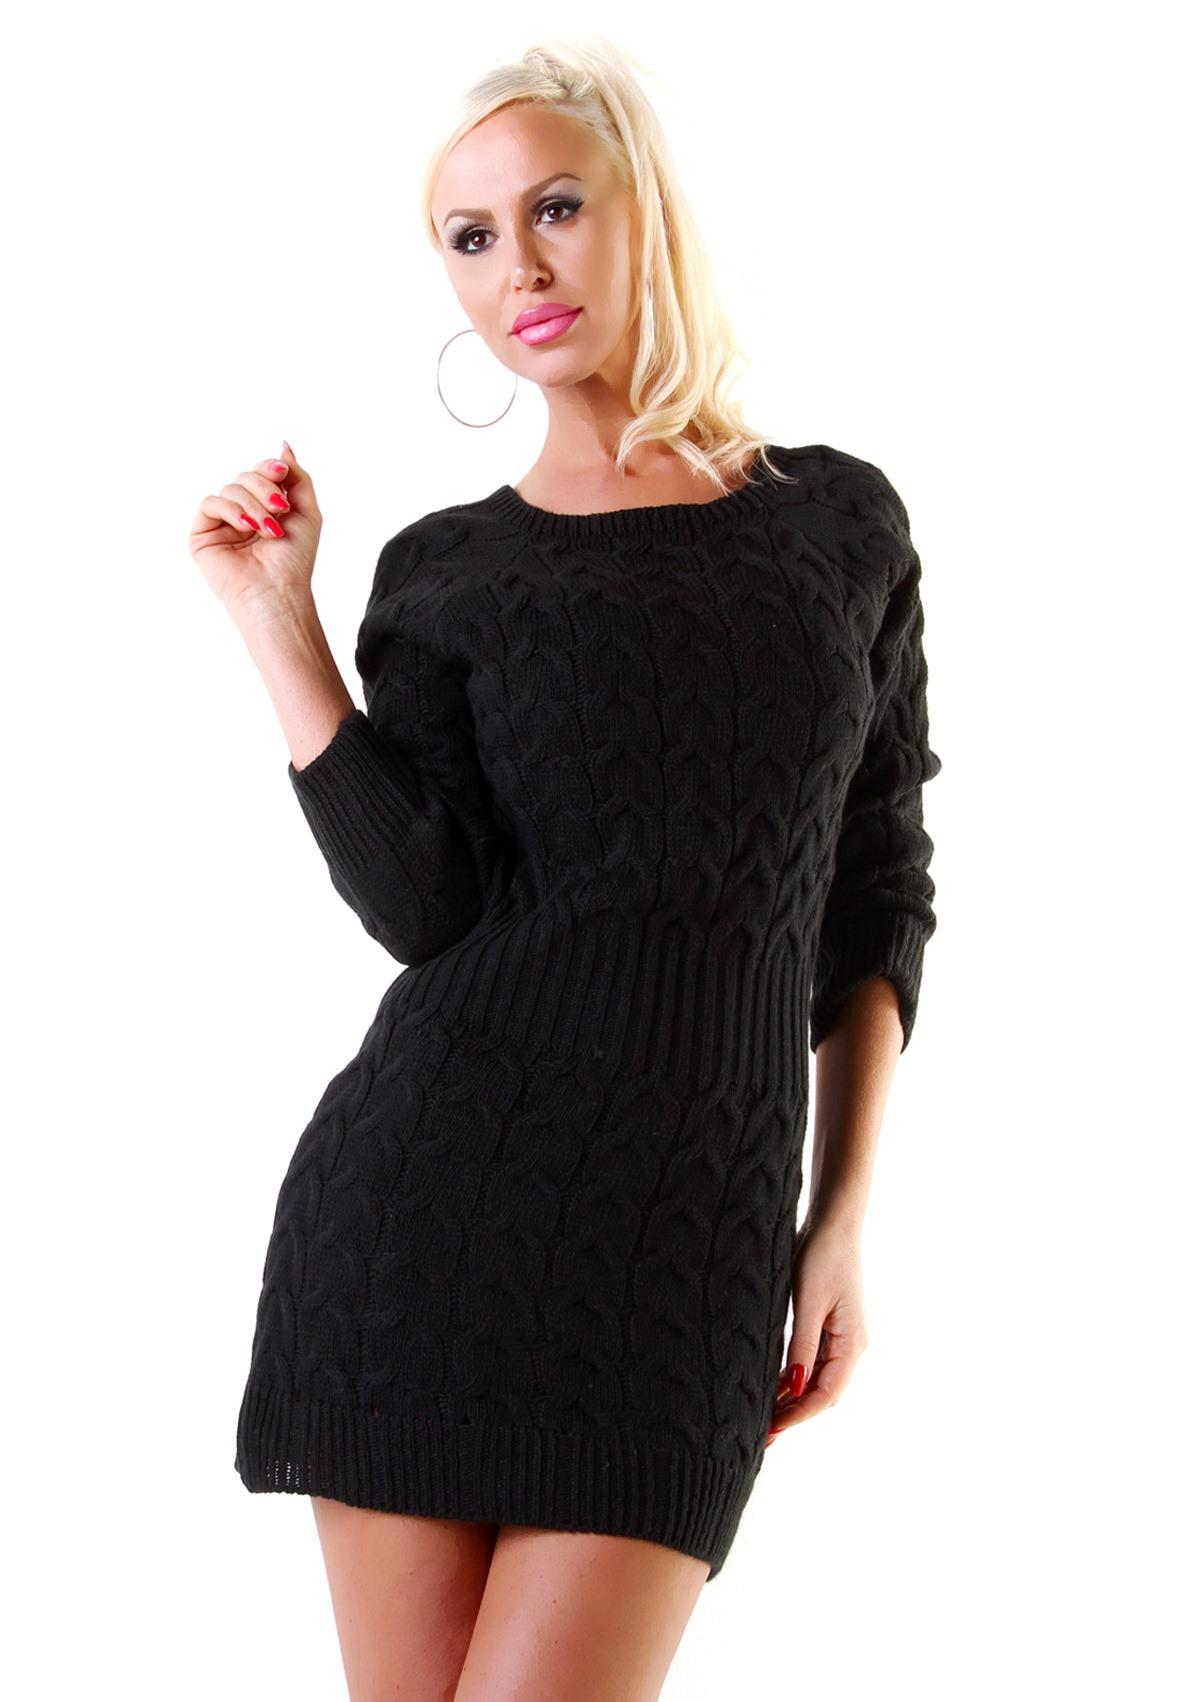 Grobstrick Kleid Langarm Zopfmuster Strickkleid Minikleid